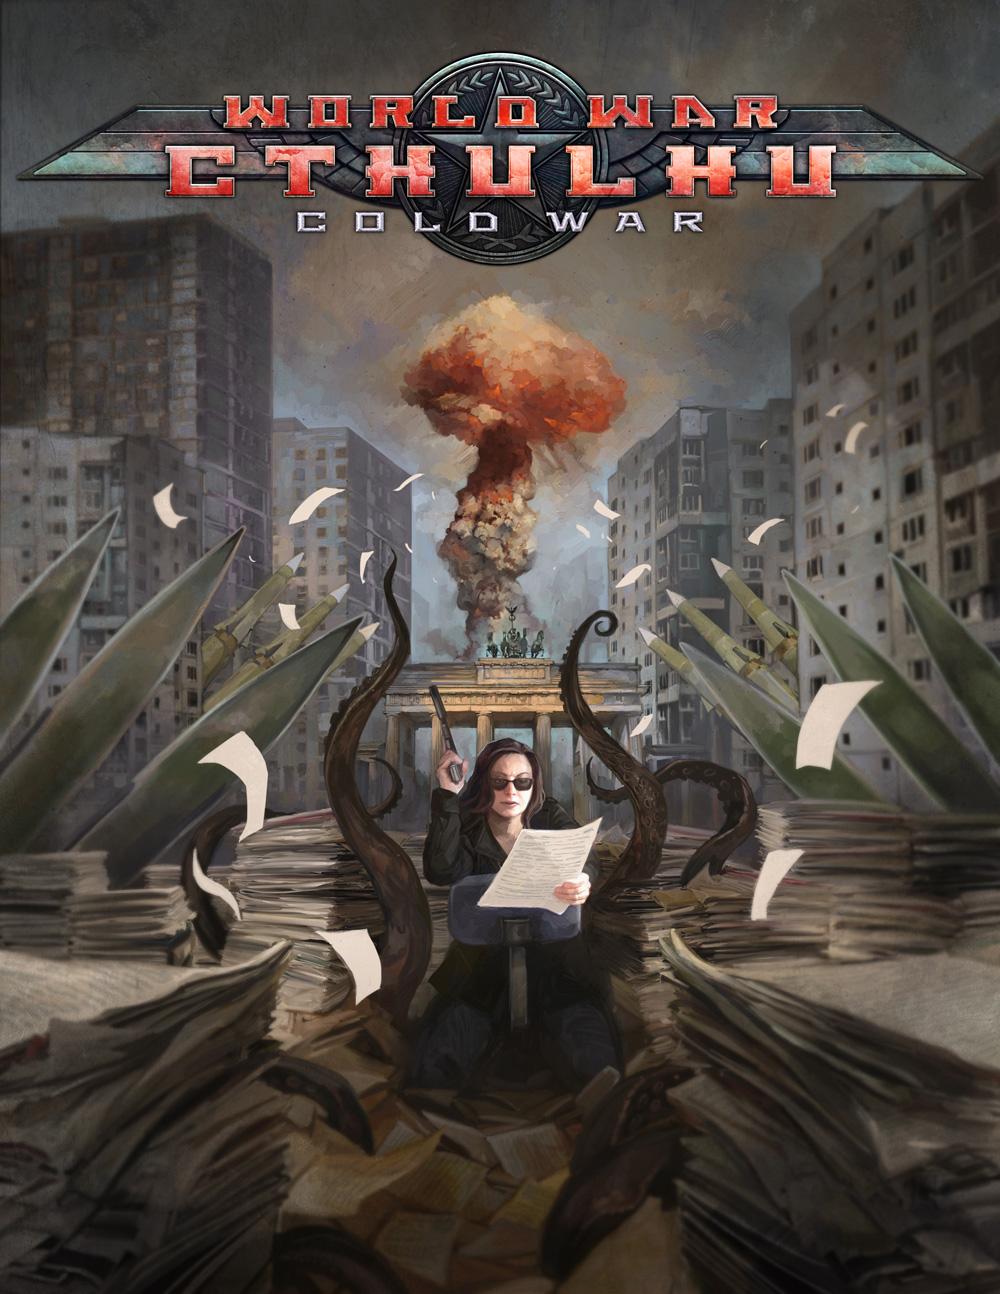 eldritch abomination stark after dark cult pulp kink charles stross a colder war 1997